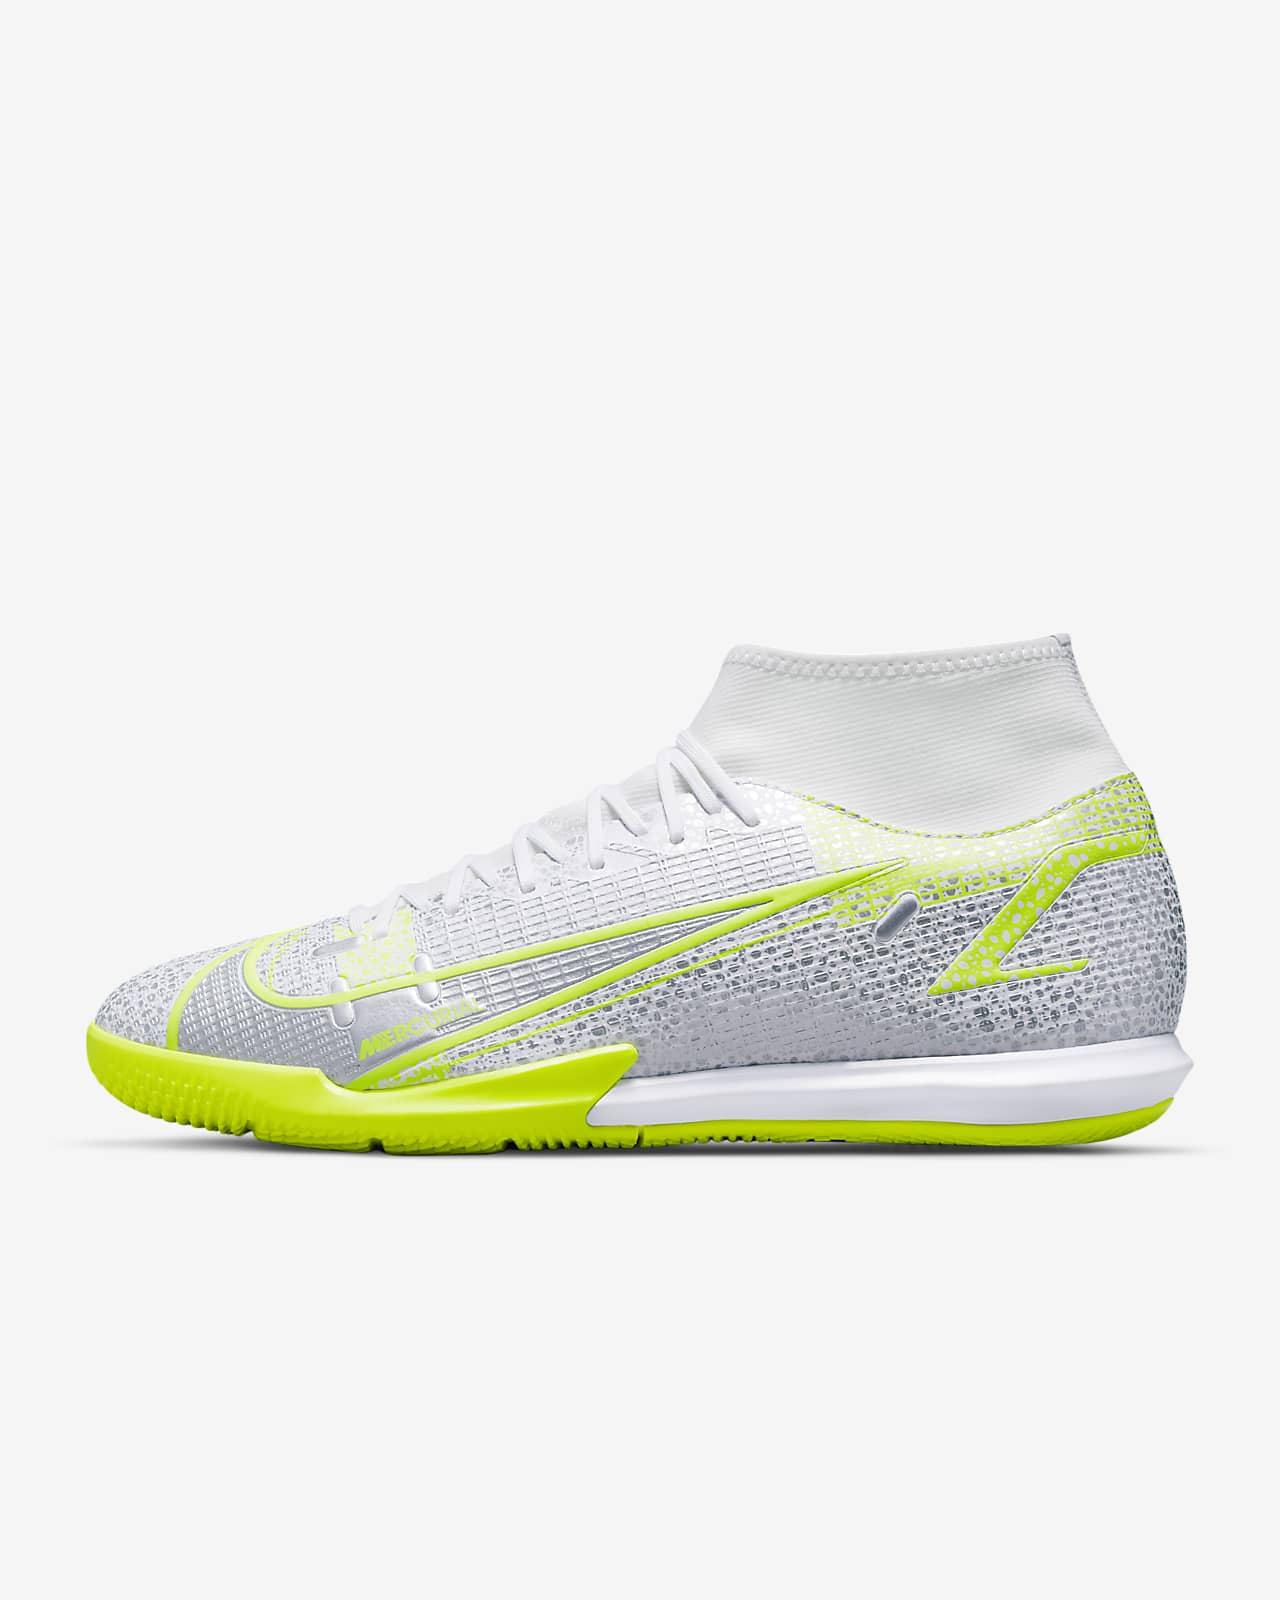 Nike Mercurial Superfly 8 Academy IC 體育館/路面足球鞋